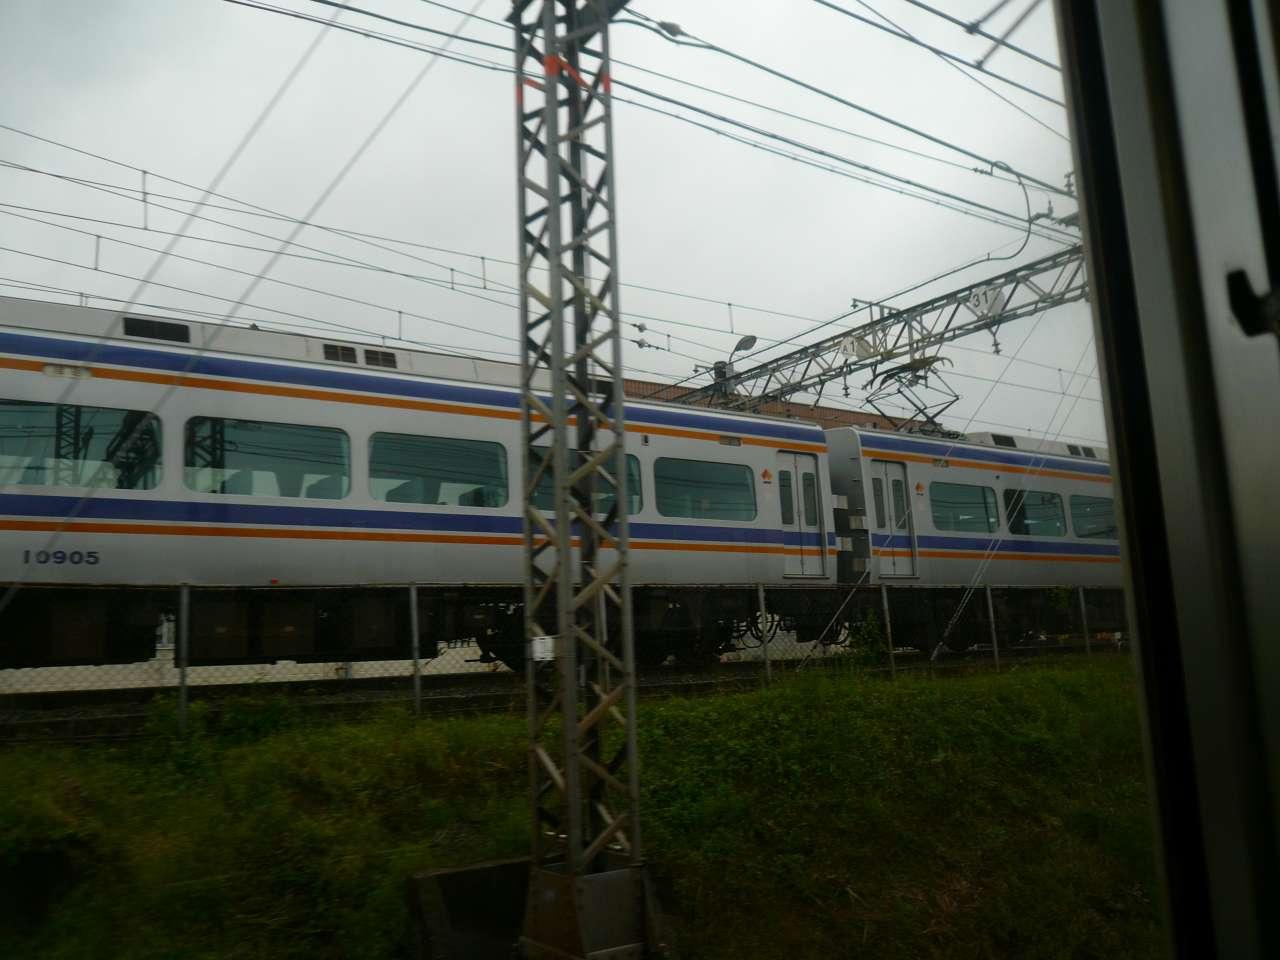 P1300307.jpg